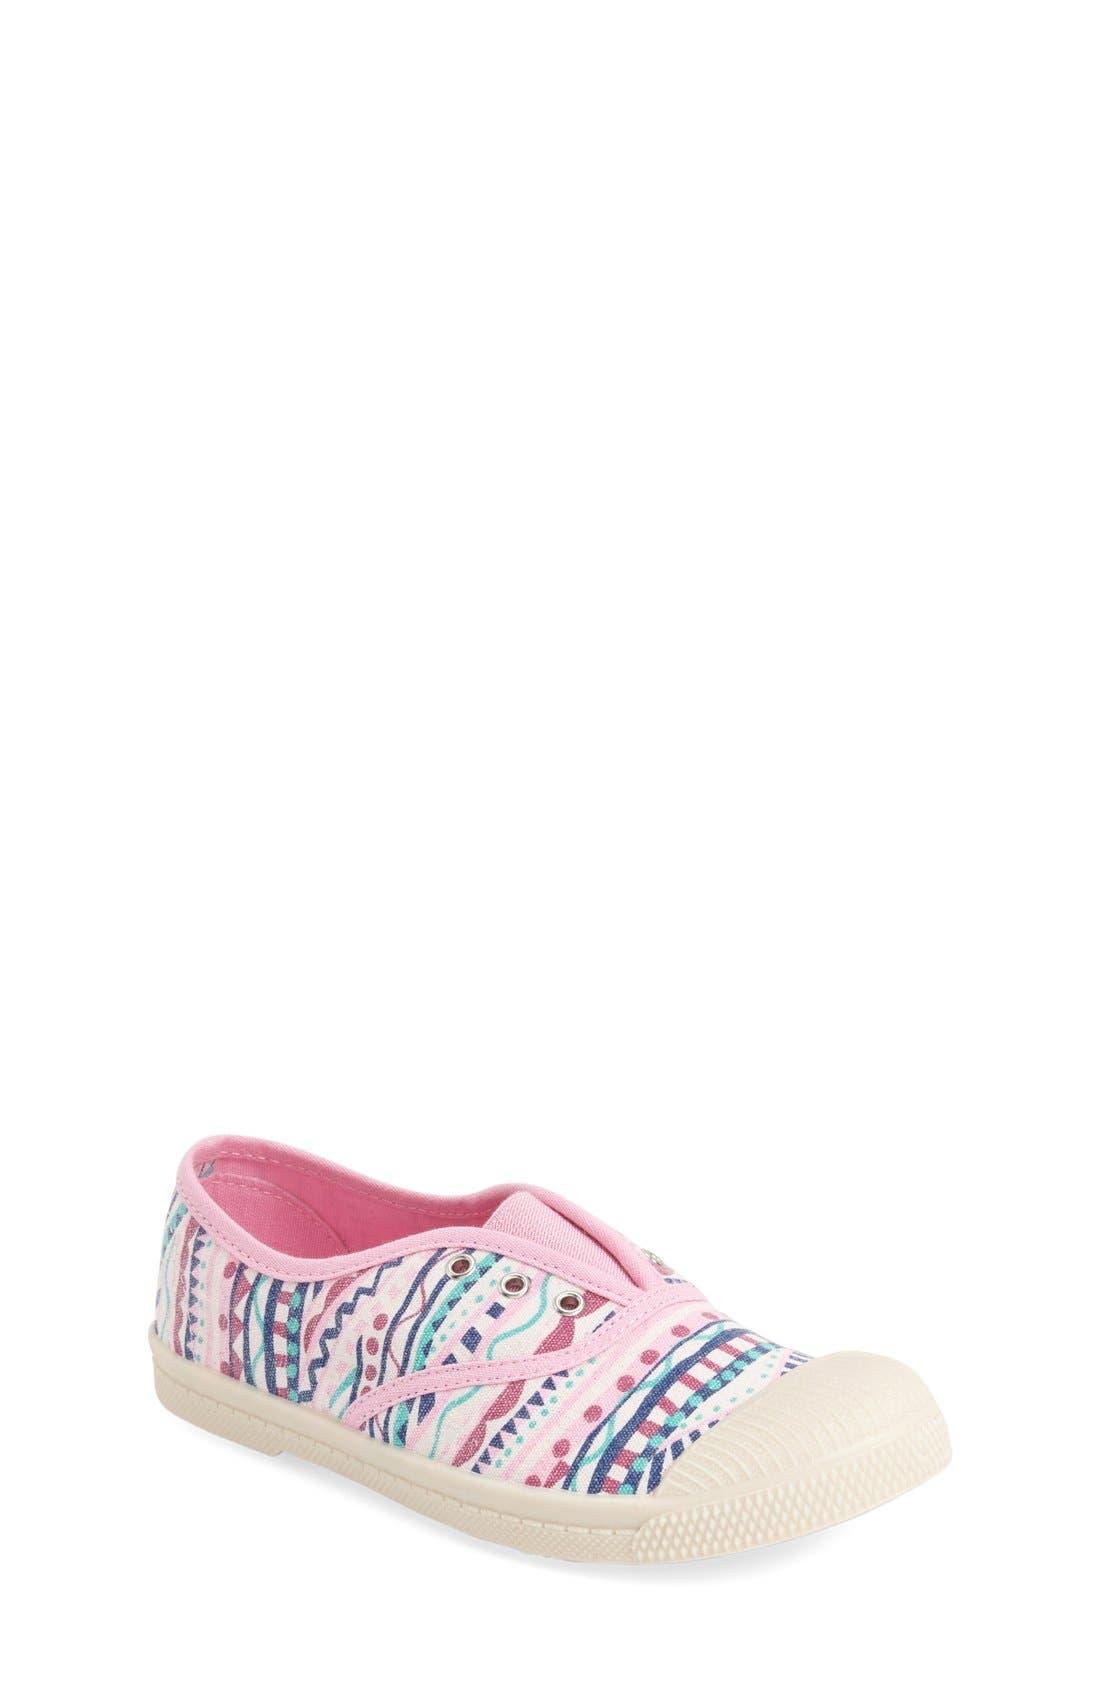 Main Image - Tucker + Tate 'Marin' Canvas Slip-On Sneaker (Toddler, Little Kid & Big Kid)